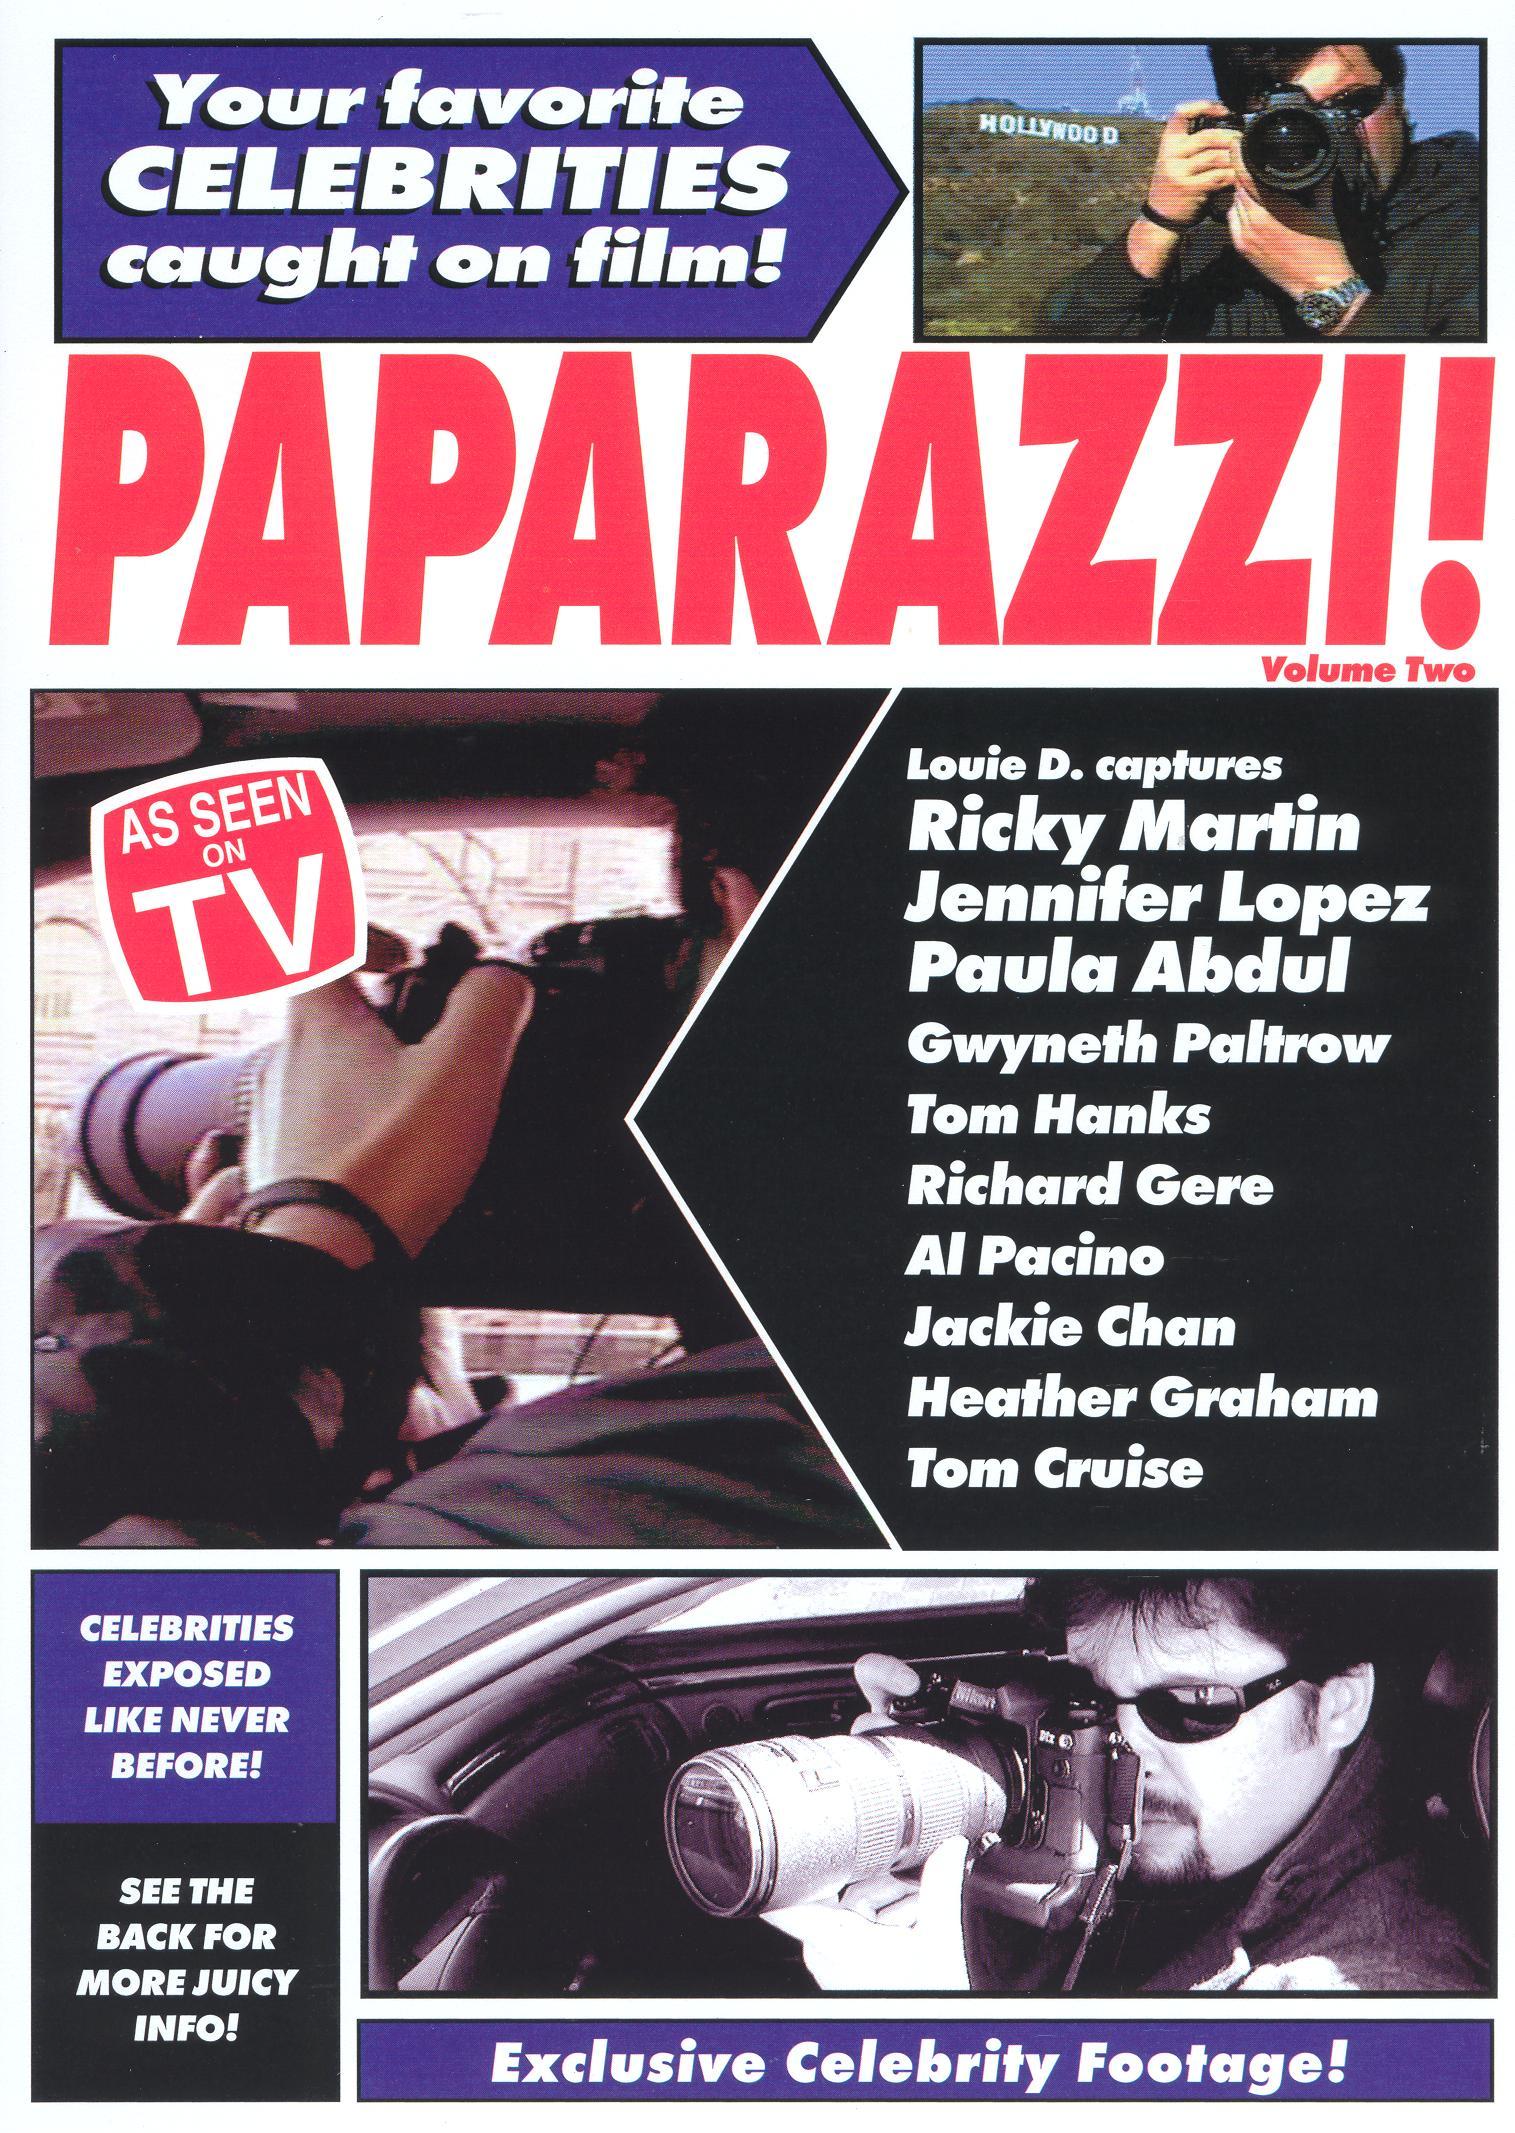 Paparazzi, Vol. 2